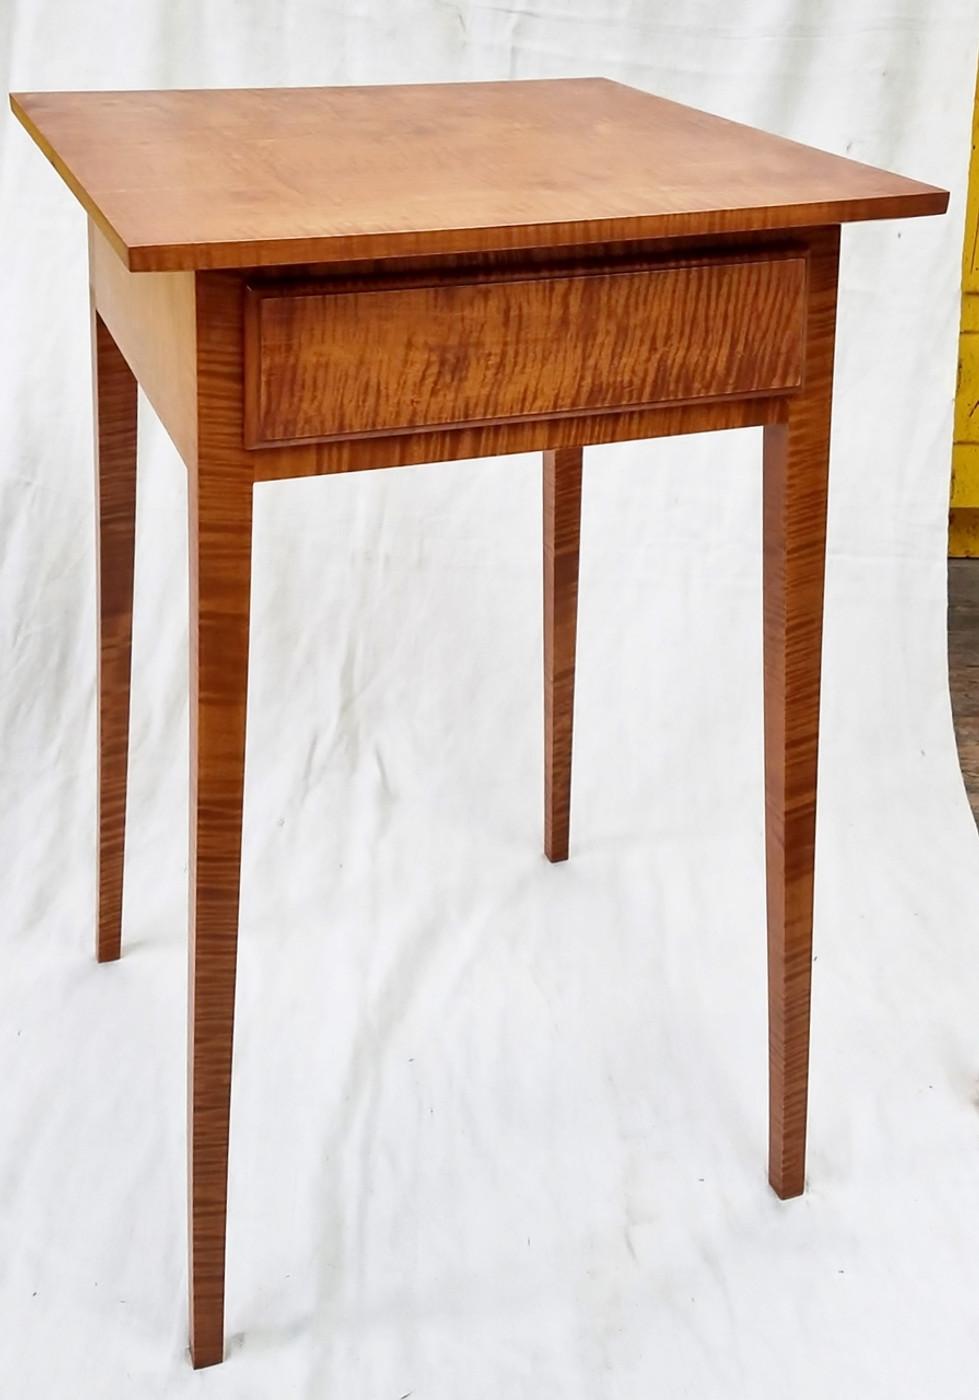 Hepplewhite Side Table With Drawer Hepplewhite Side Table With Drawer